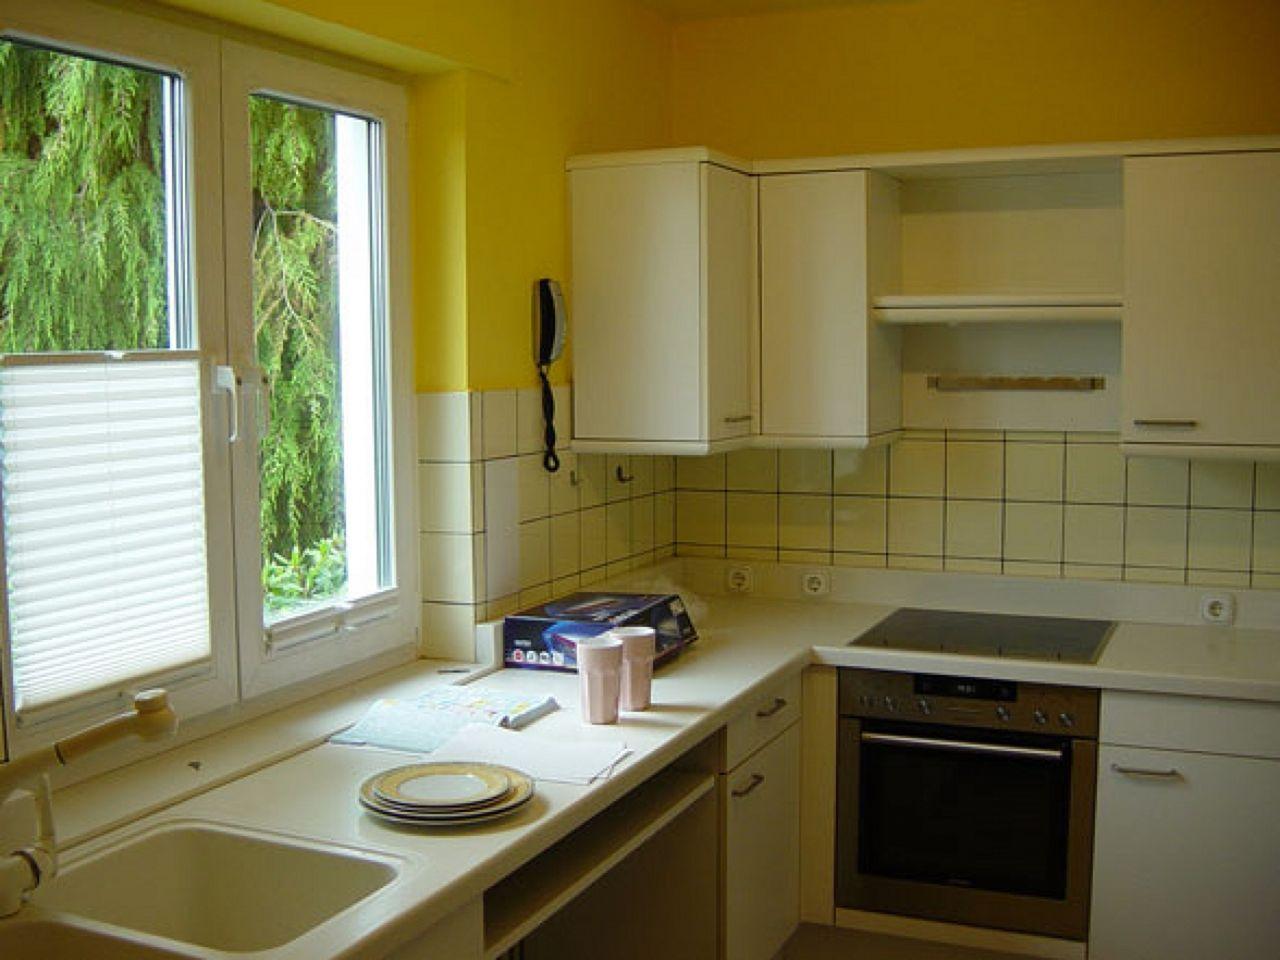 9 Incredible Modern Small Kitchen Design Ideas   Kitchen design ...